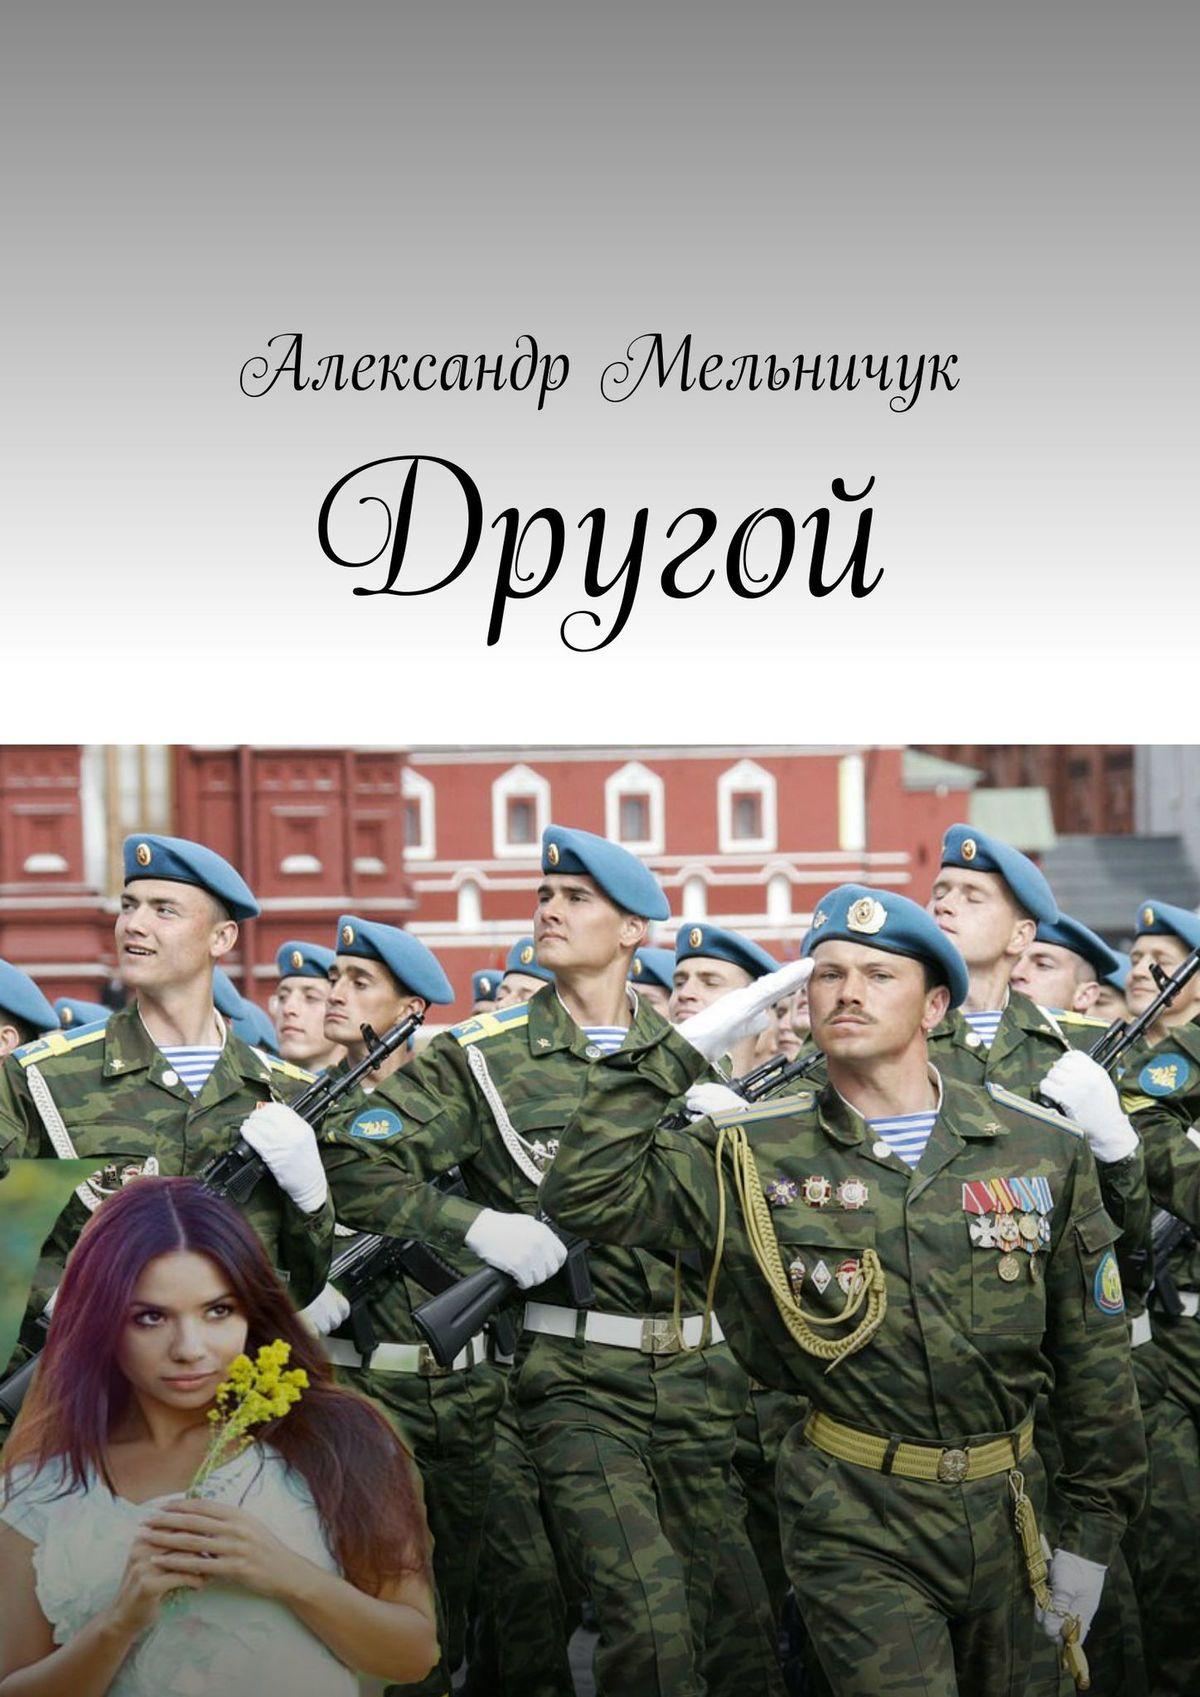 цена на Александр Мельничук Другой